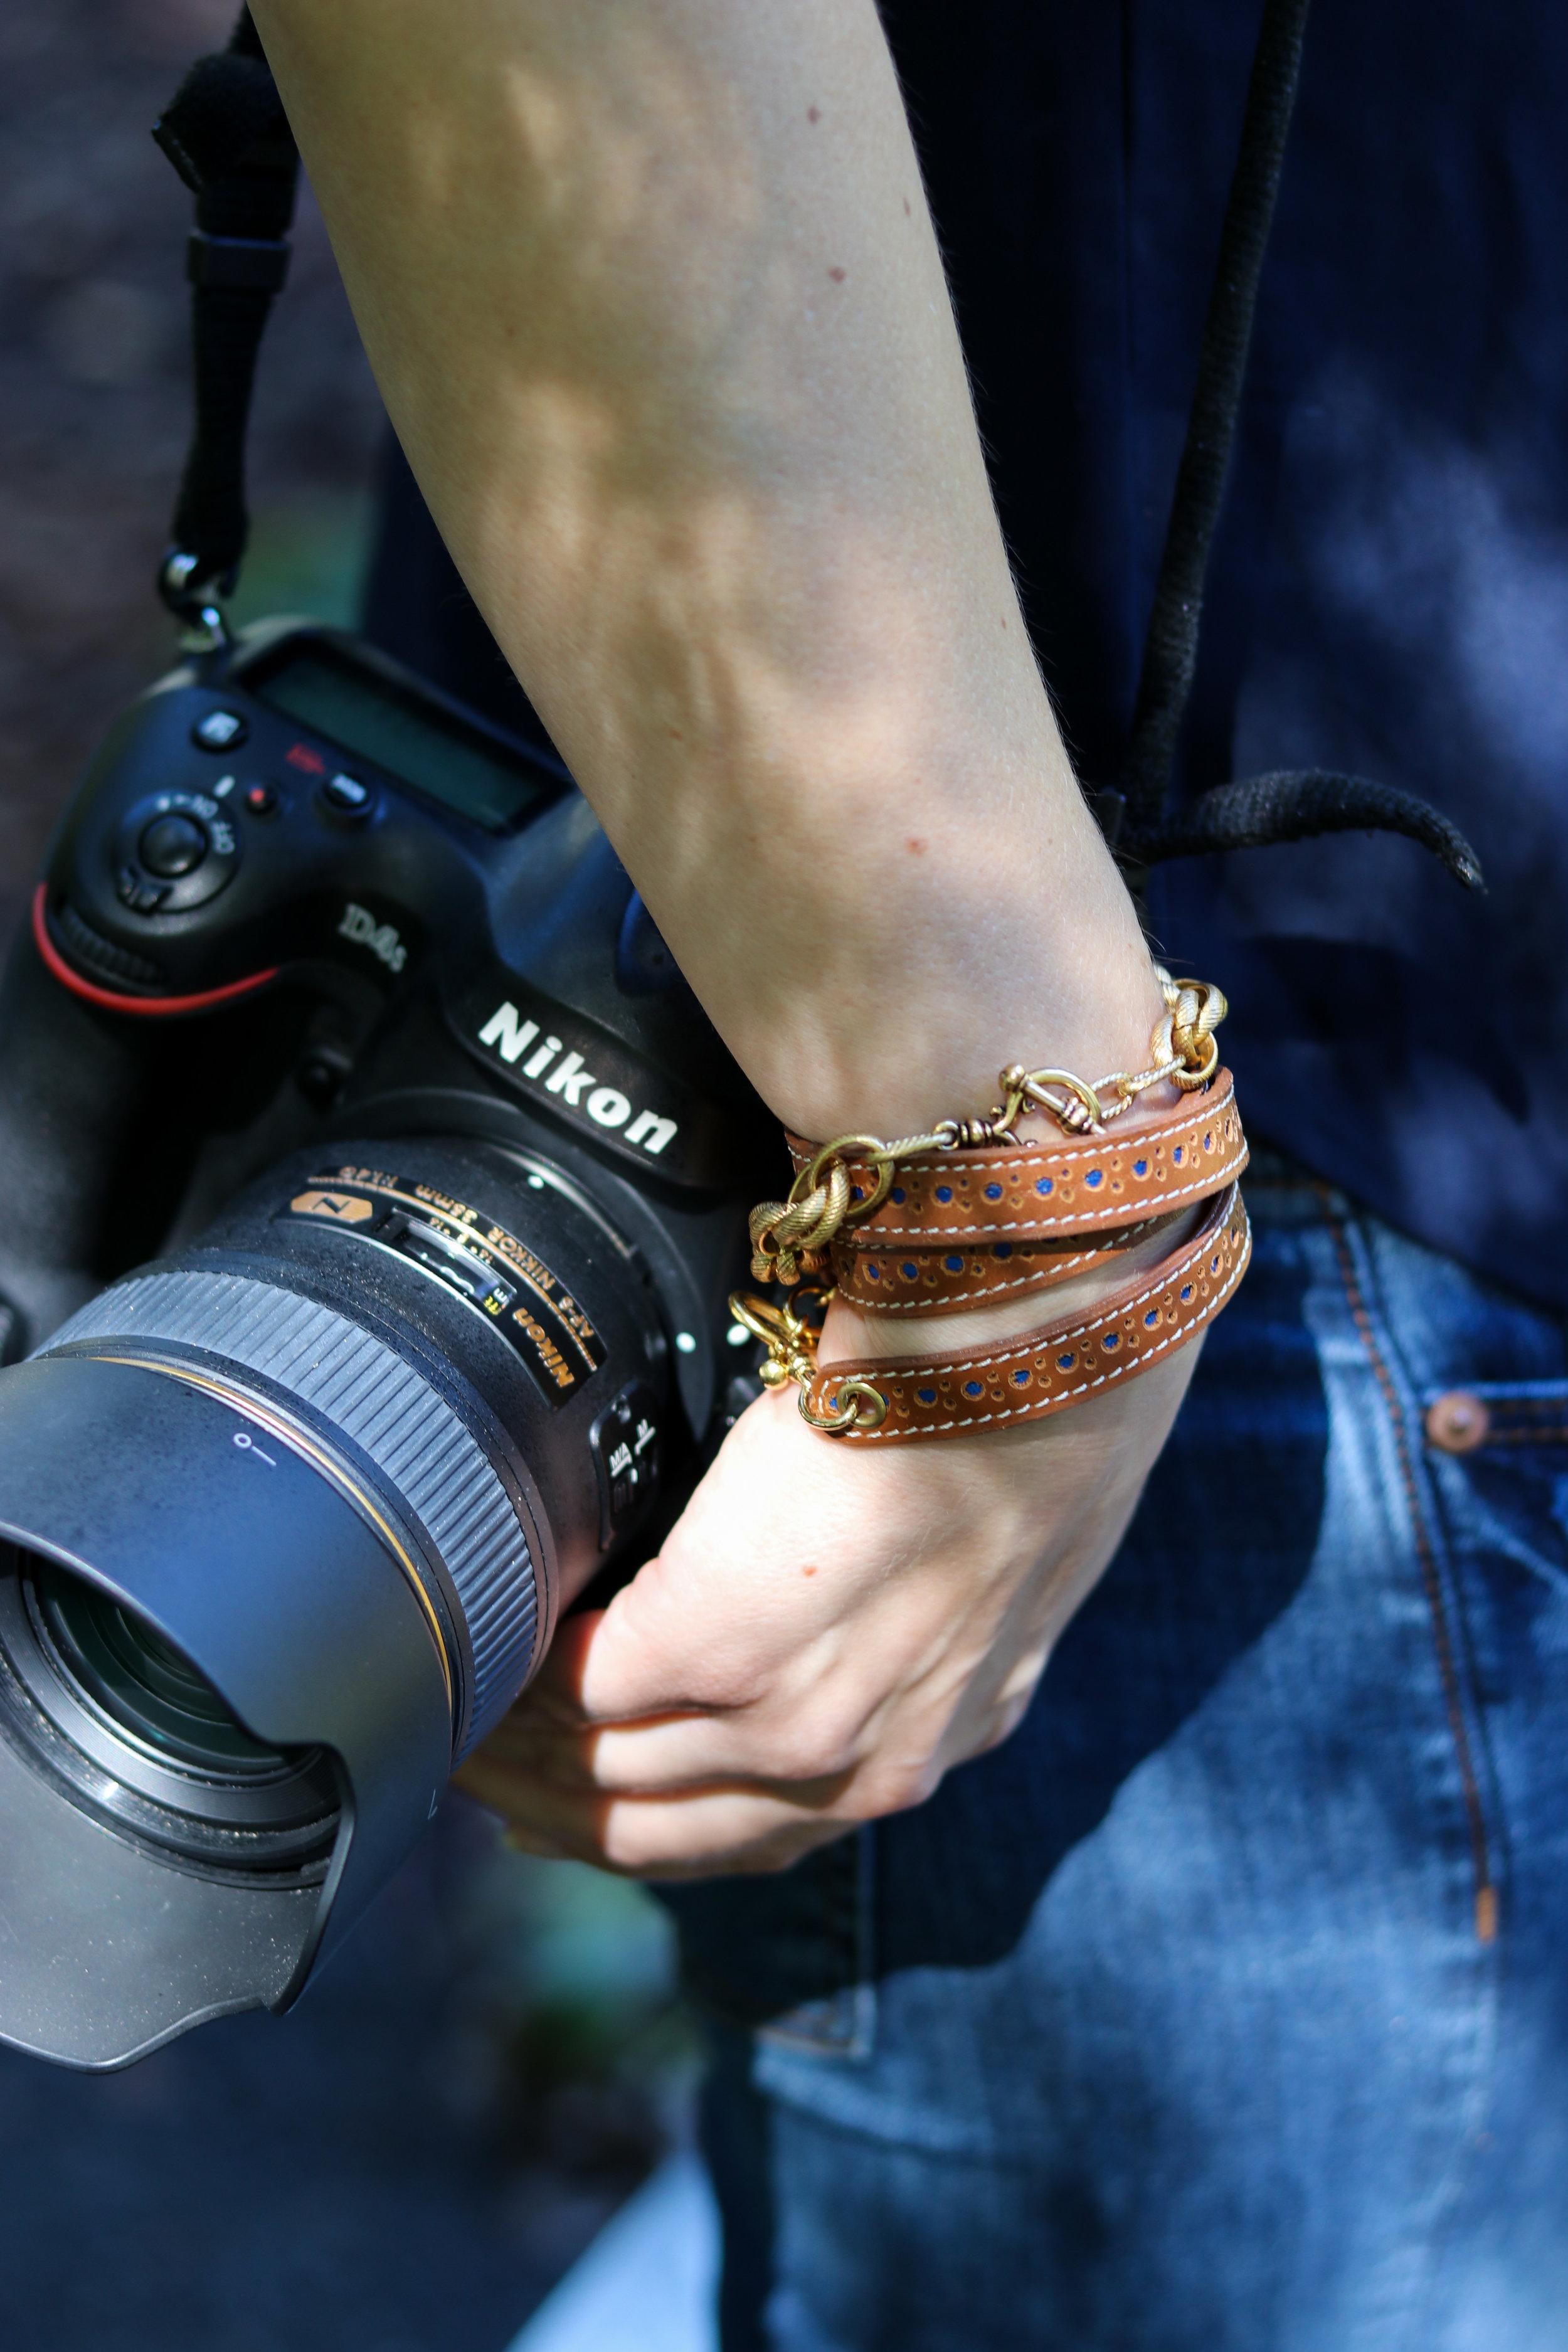 Shop similar bracelet  HERE . Shop the Kate Bracelet  HERE .